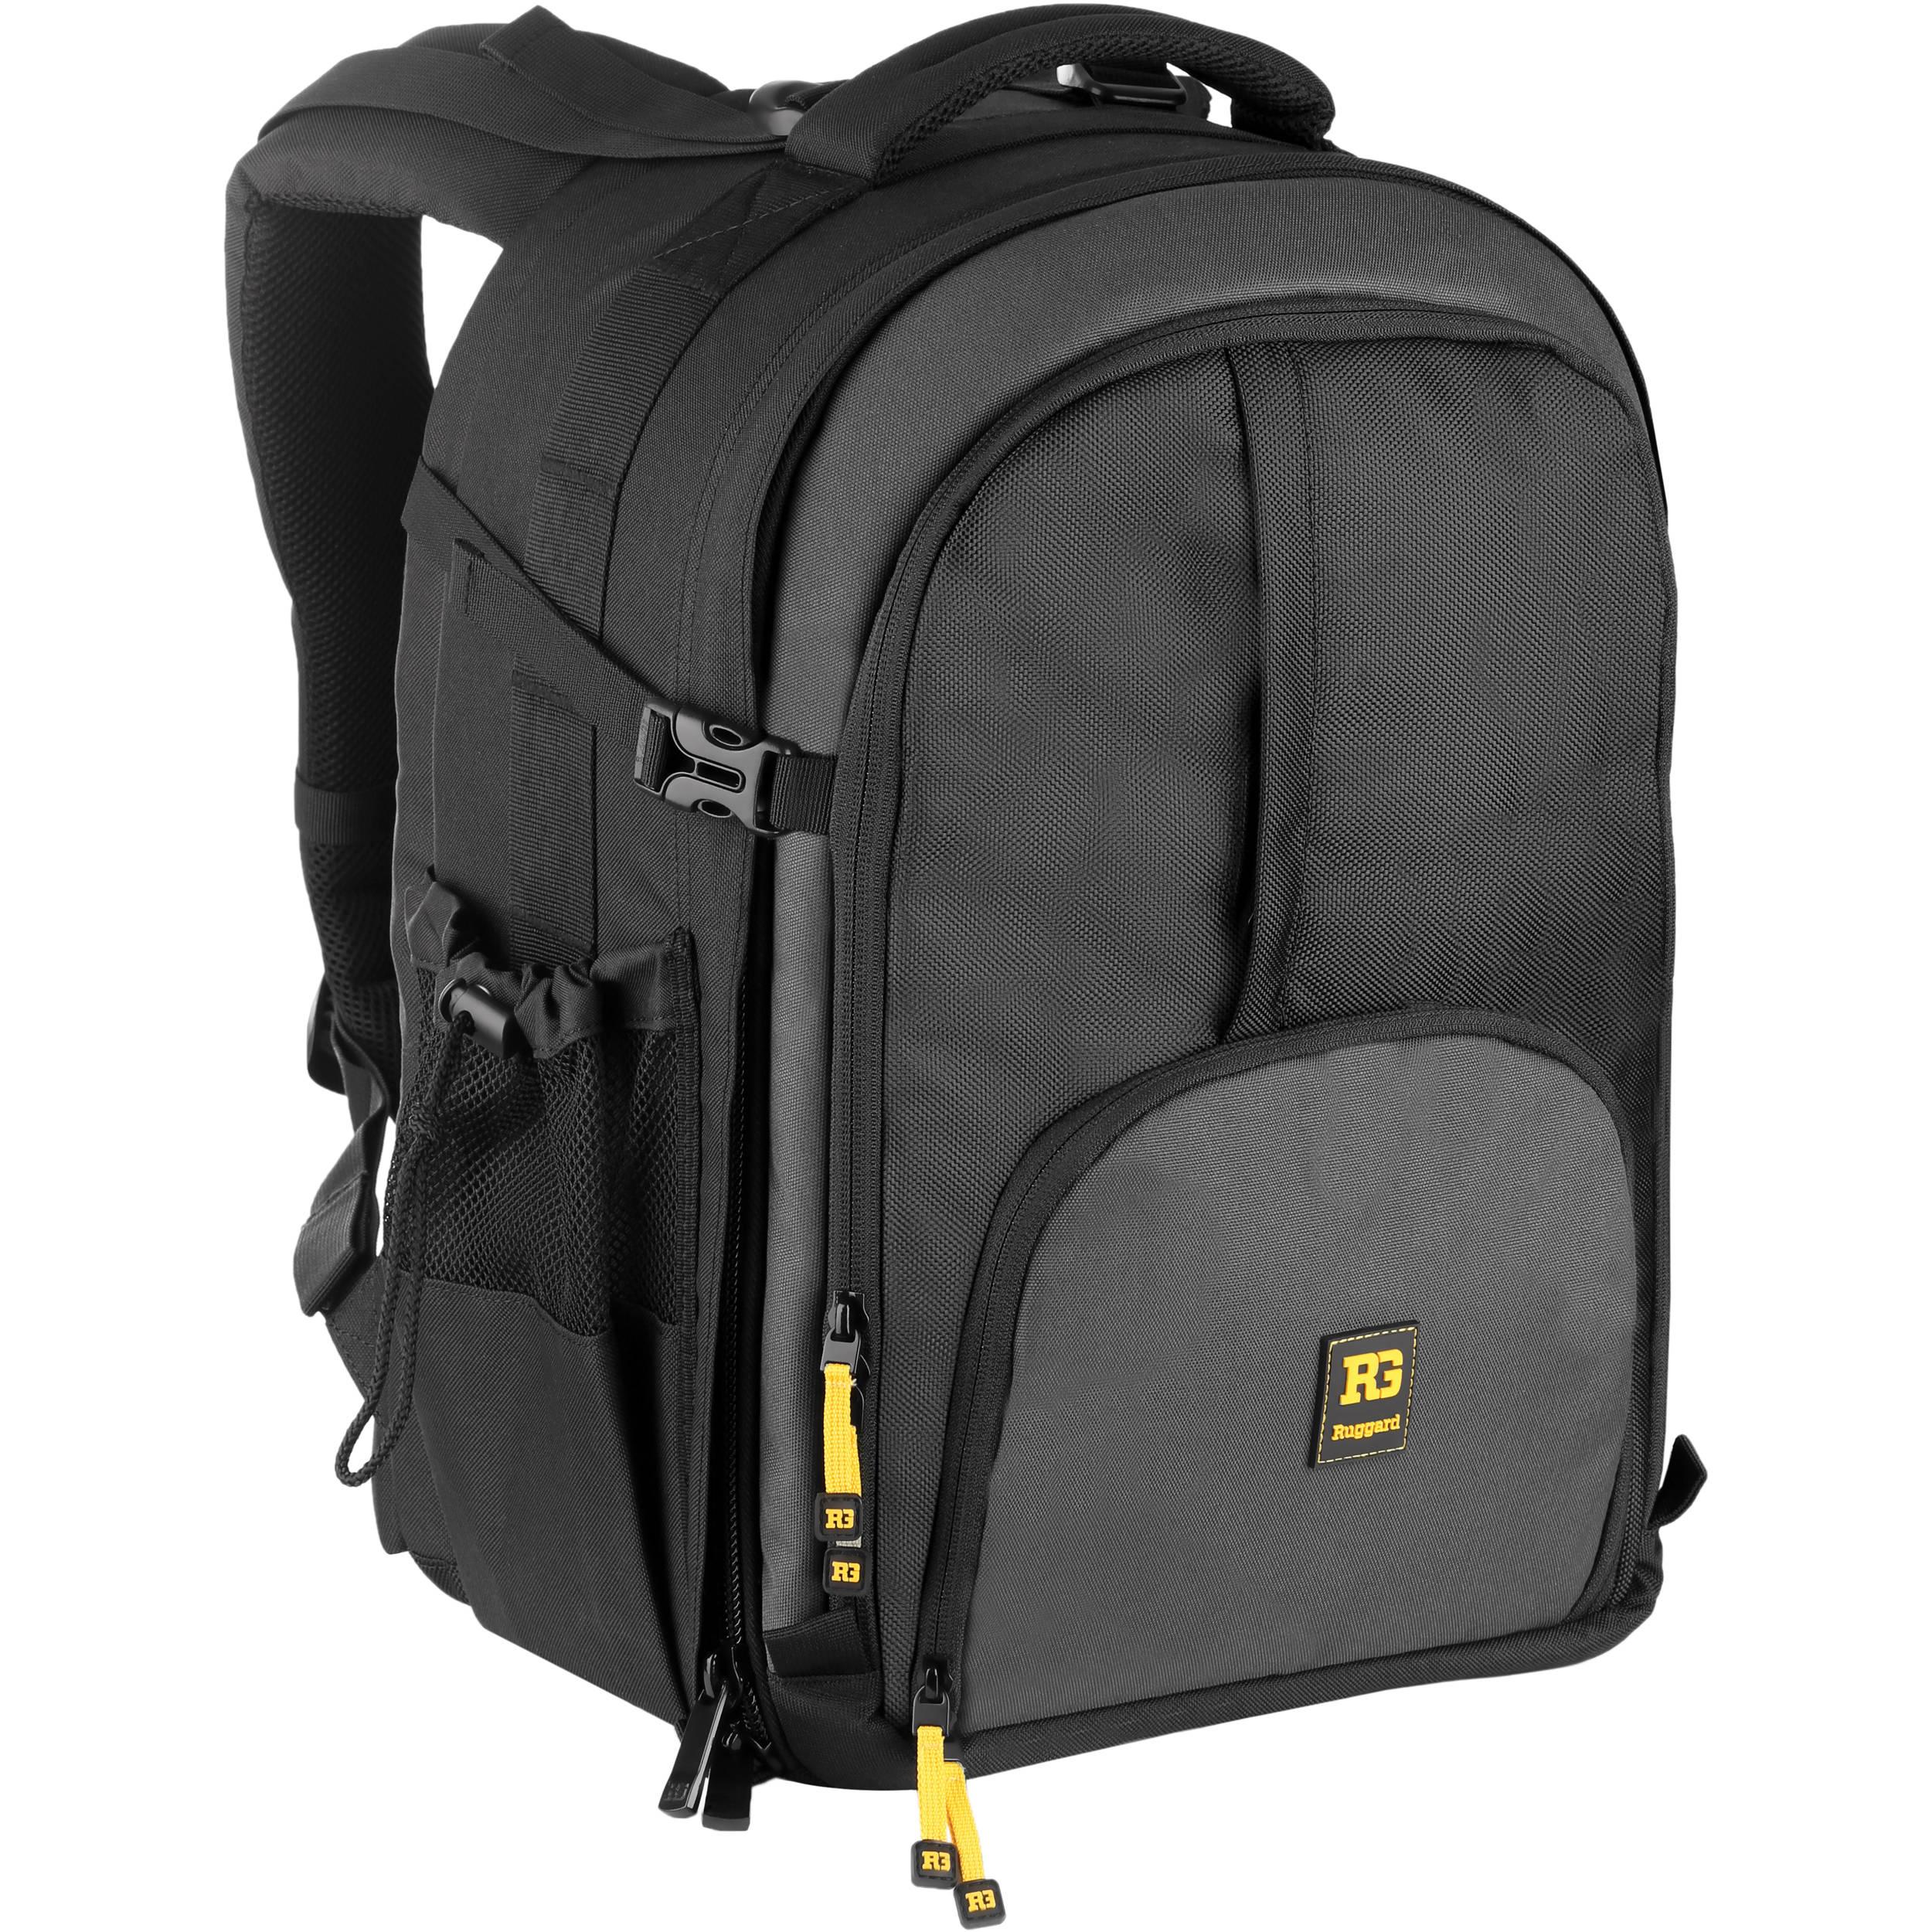 Ruggard Thunderhead 55 DSLR & Laptop Backpack PBB-255B B&H